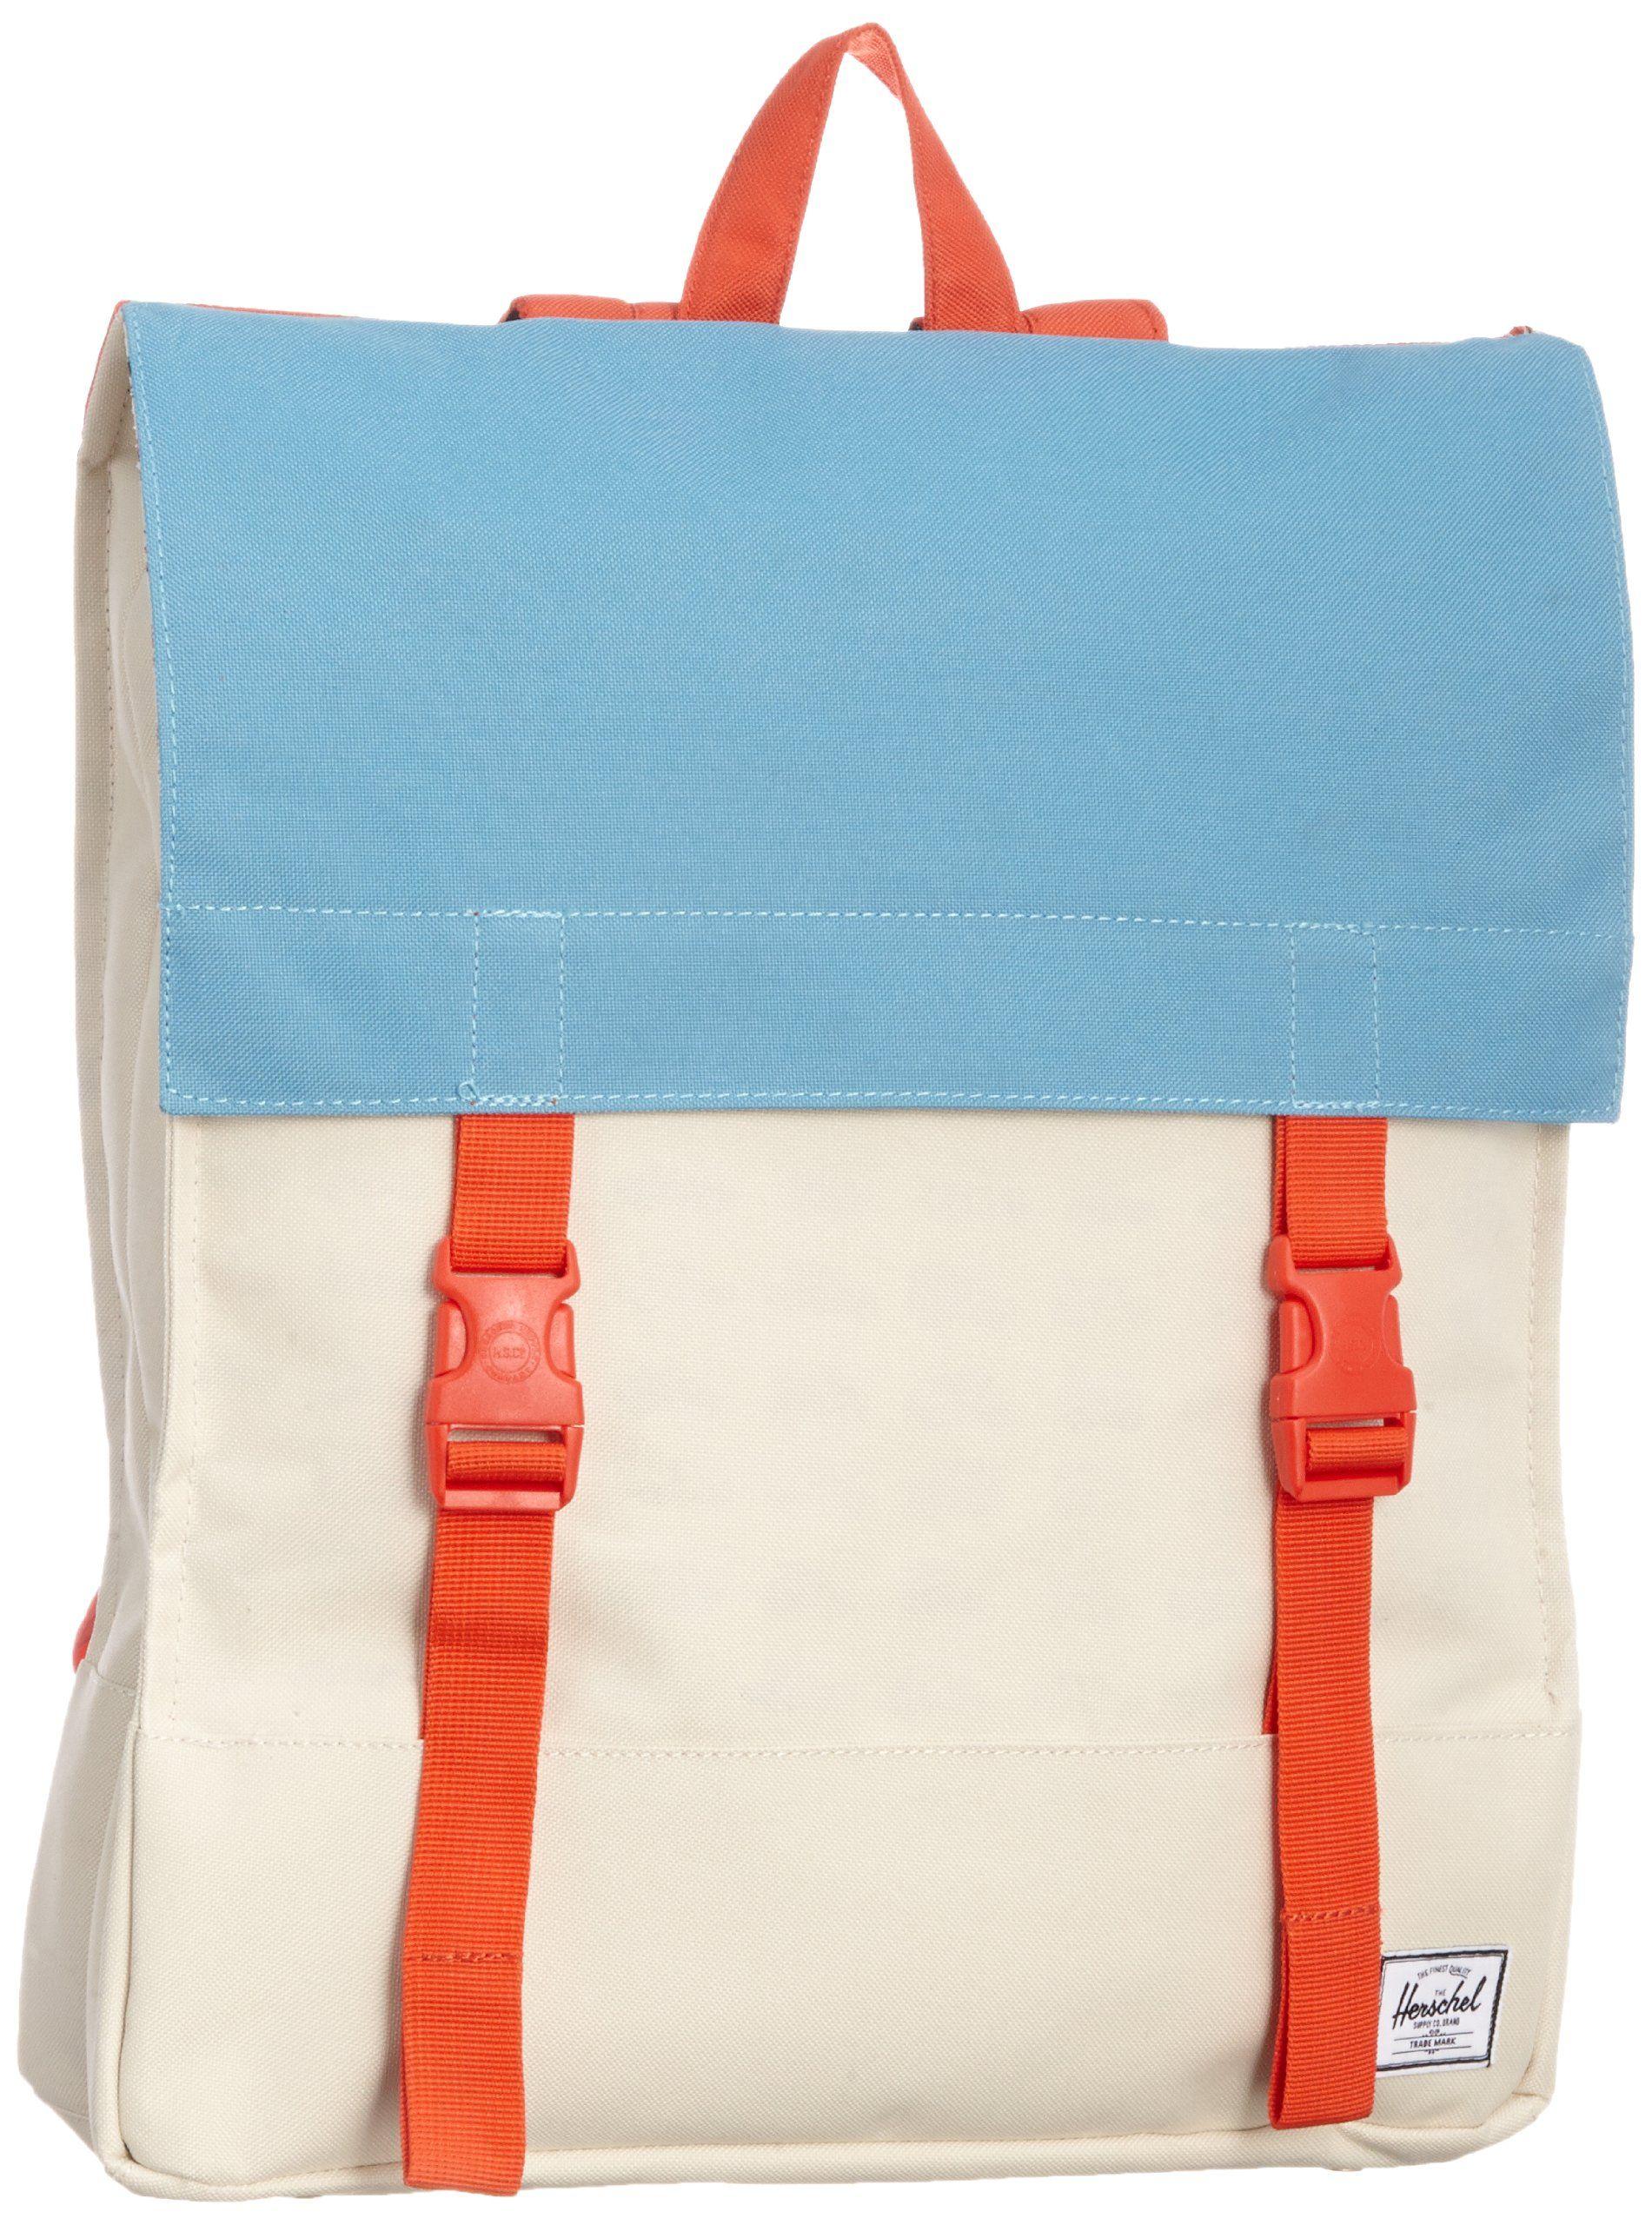 5da99a438 Herschel Supply Co. Women's Survey Backpack, Bone/Synchro Red ...